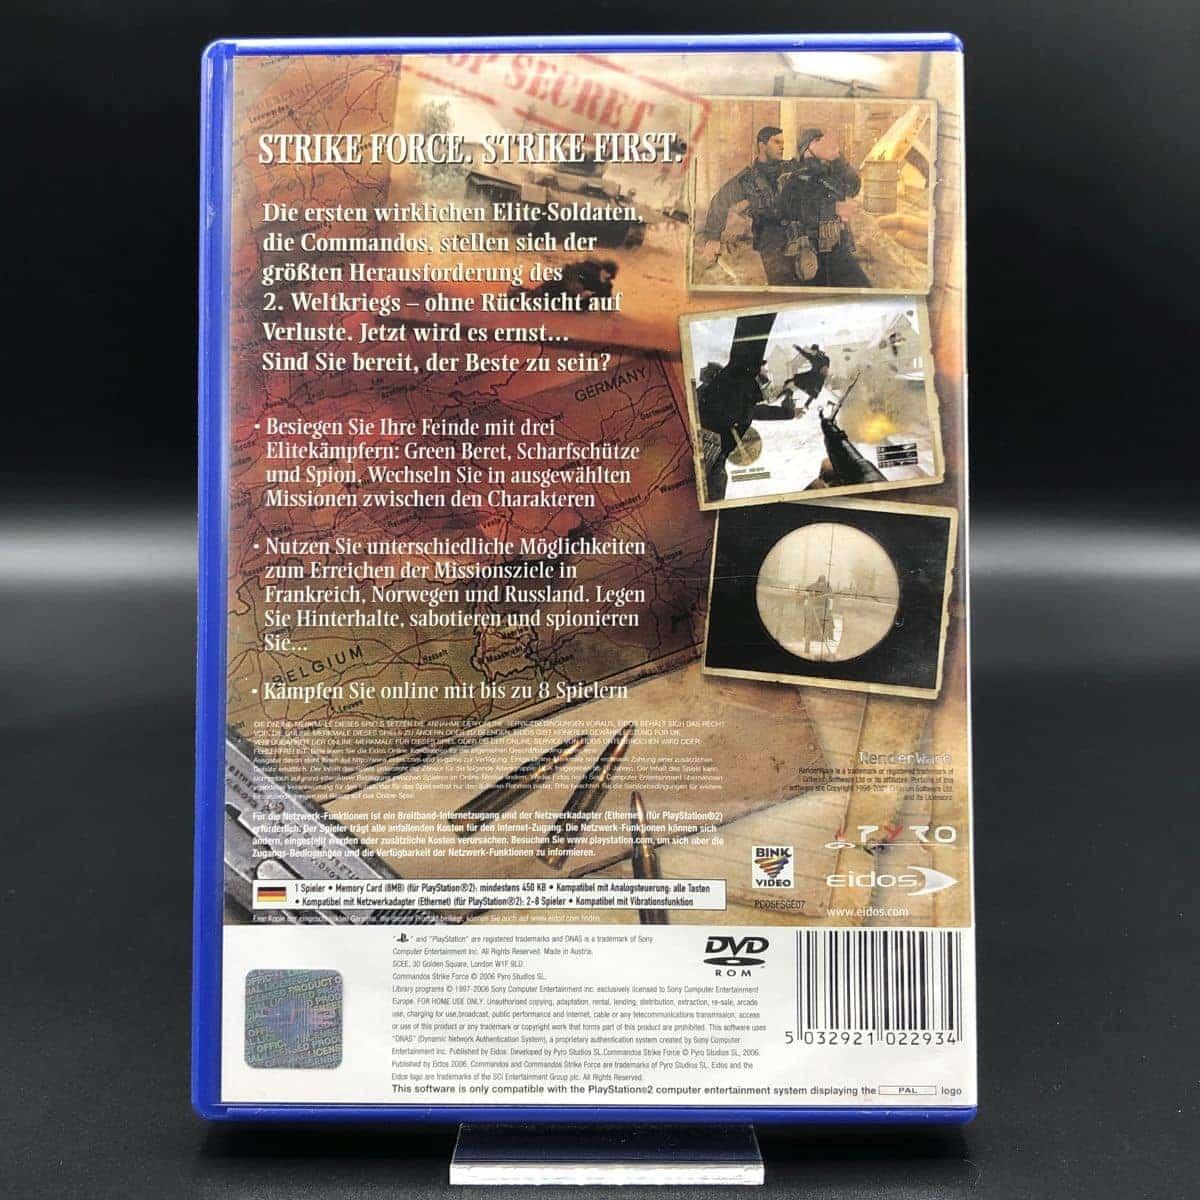 PS2 Commandos: Strike Force (Komplett) (Sehr gut) Sony PlayStation 2 (FSK18)